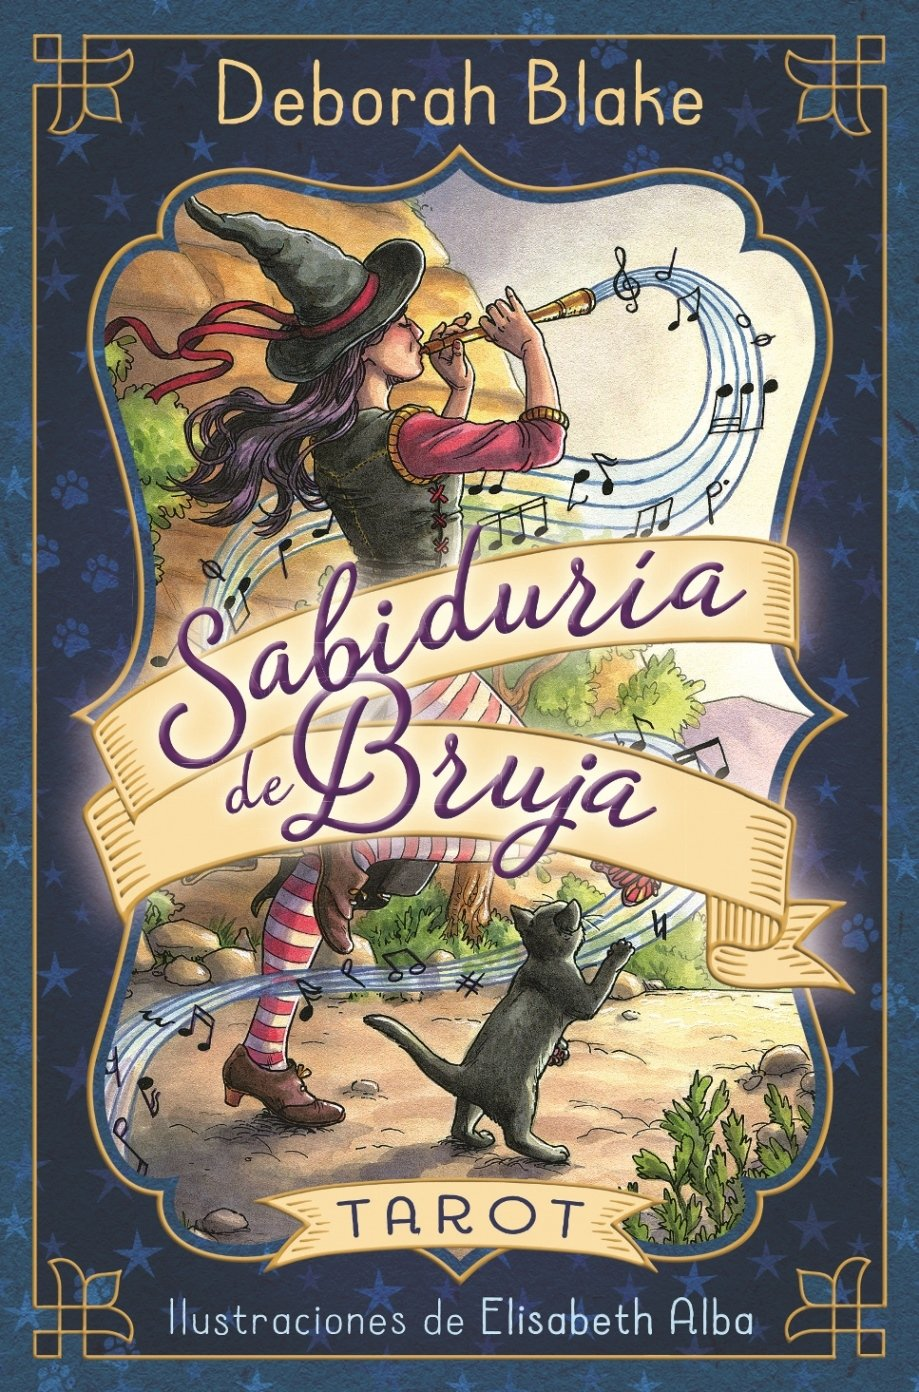 Sabiduria de bruja. Tarot (Spanish Edition): Deborah Blake ...